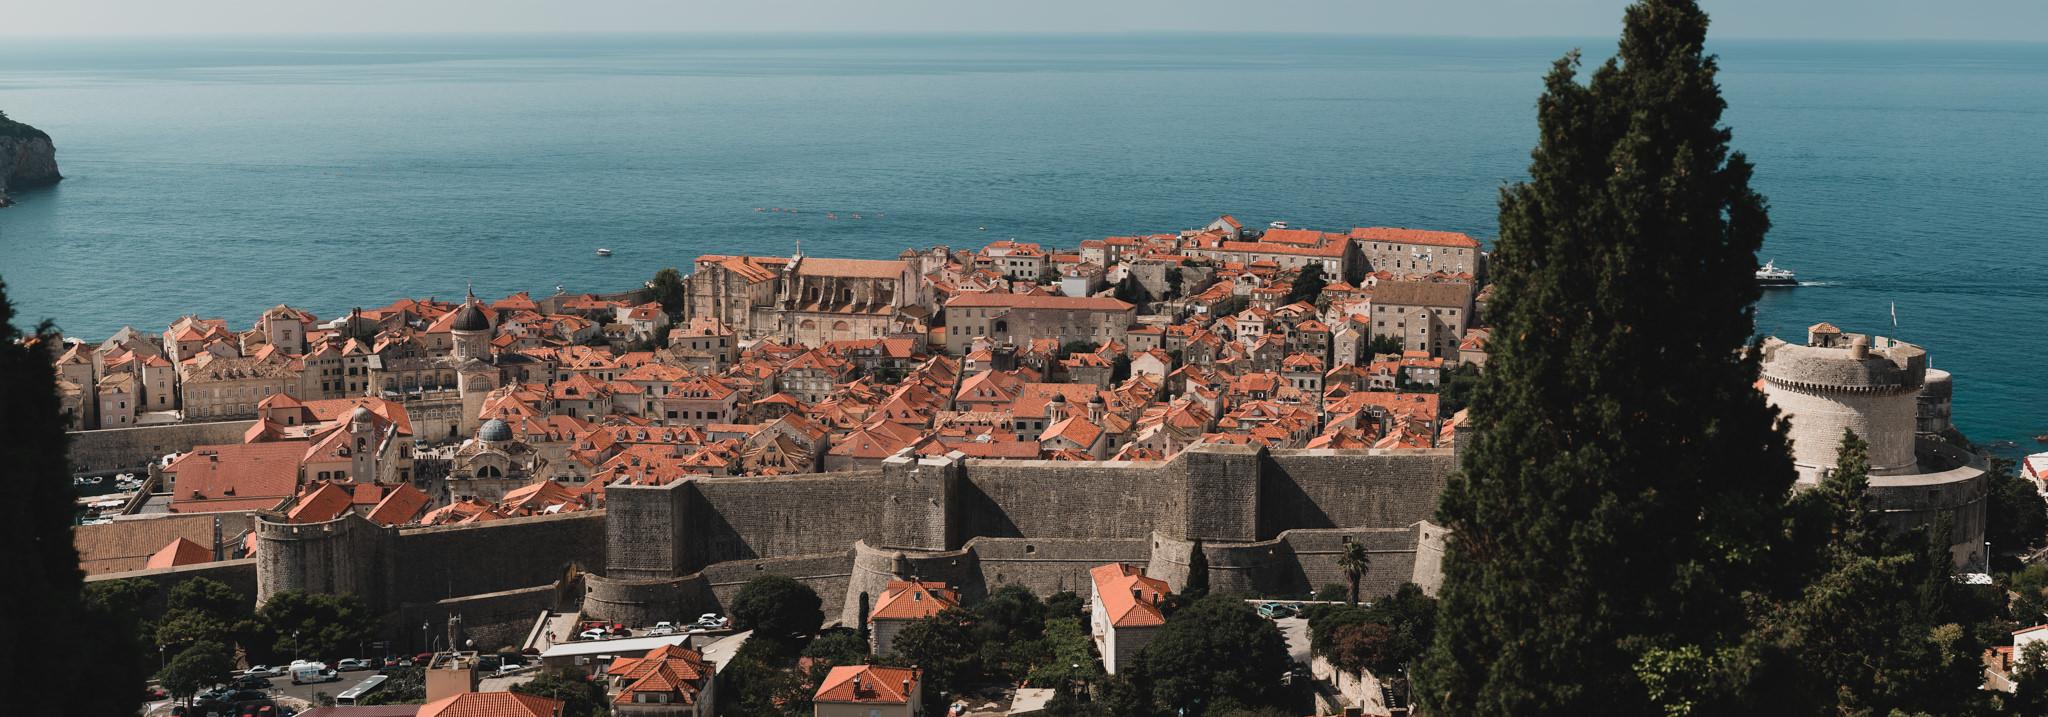 227-WEB-Jonathan-Kuhn-Photography-Croatia-.jpg